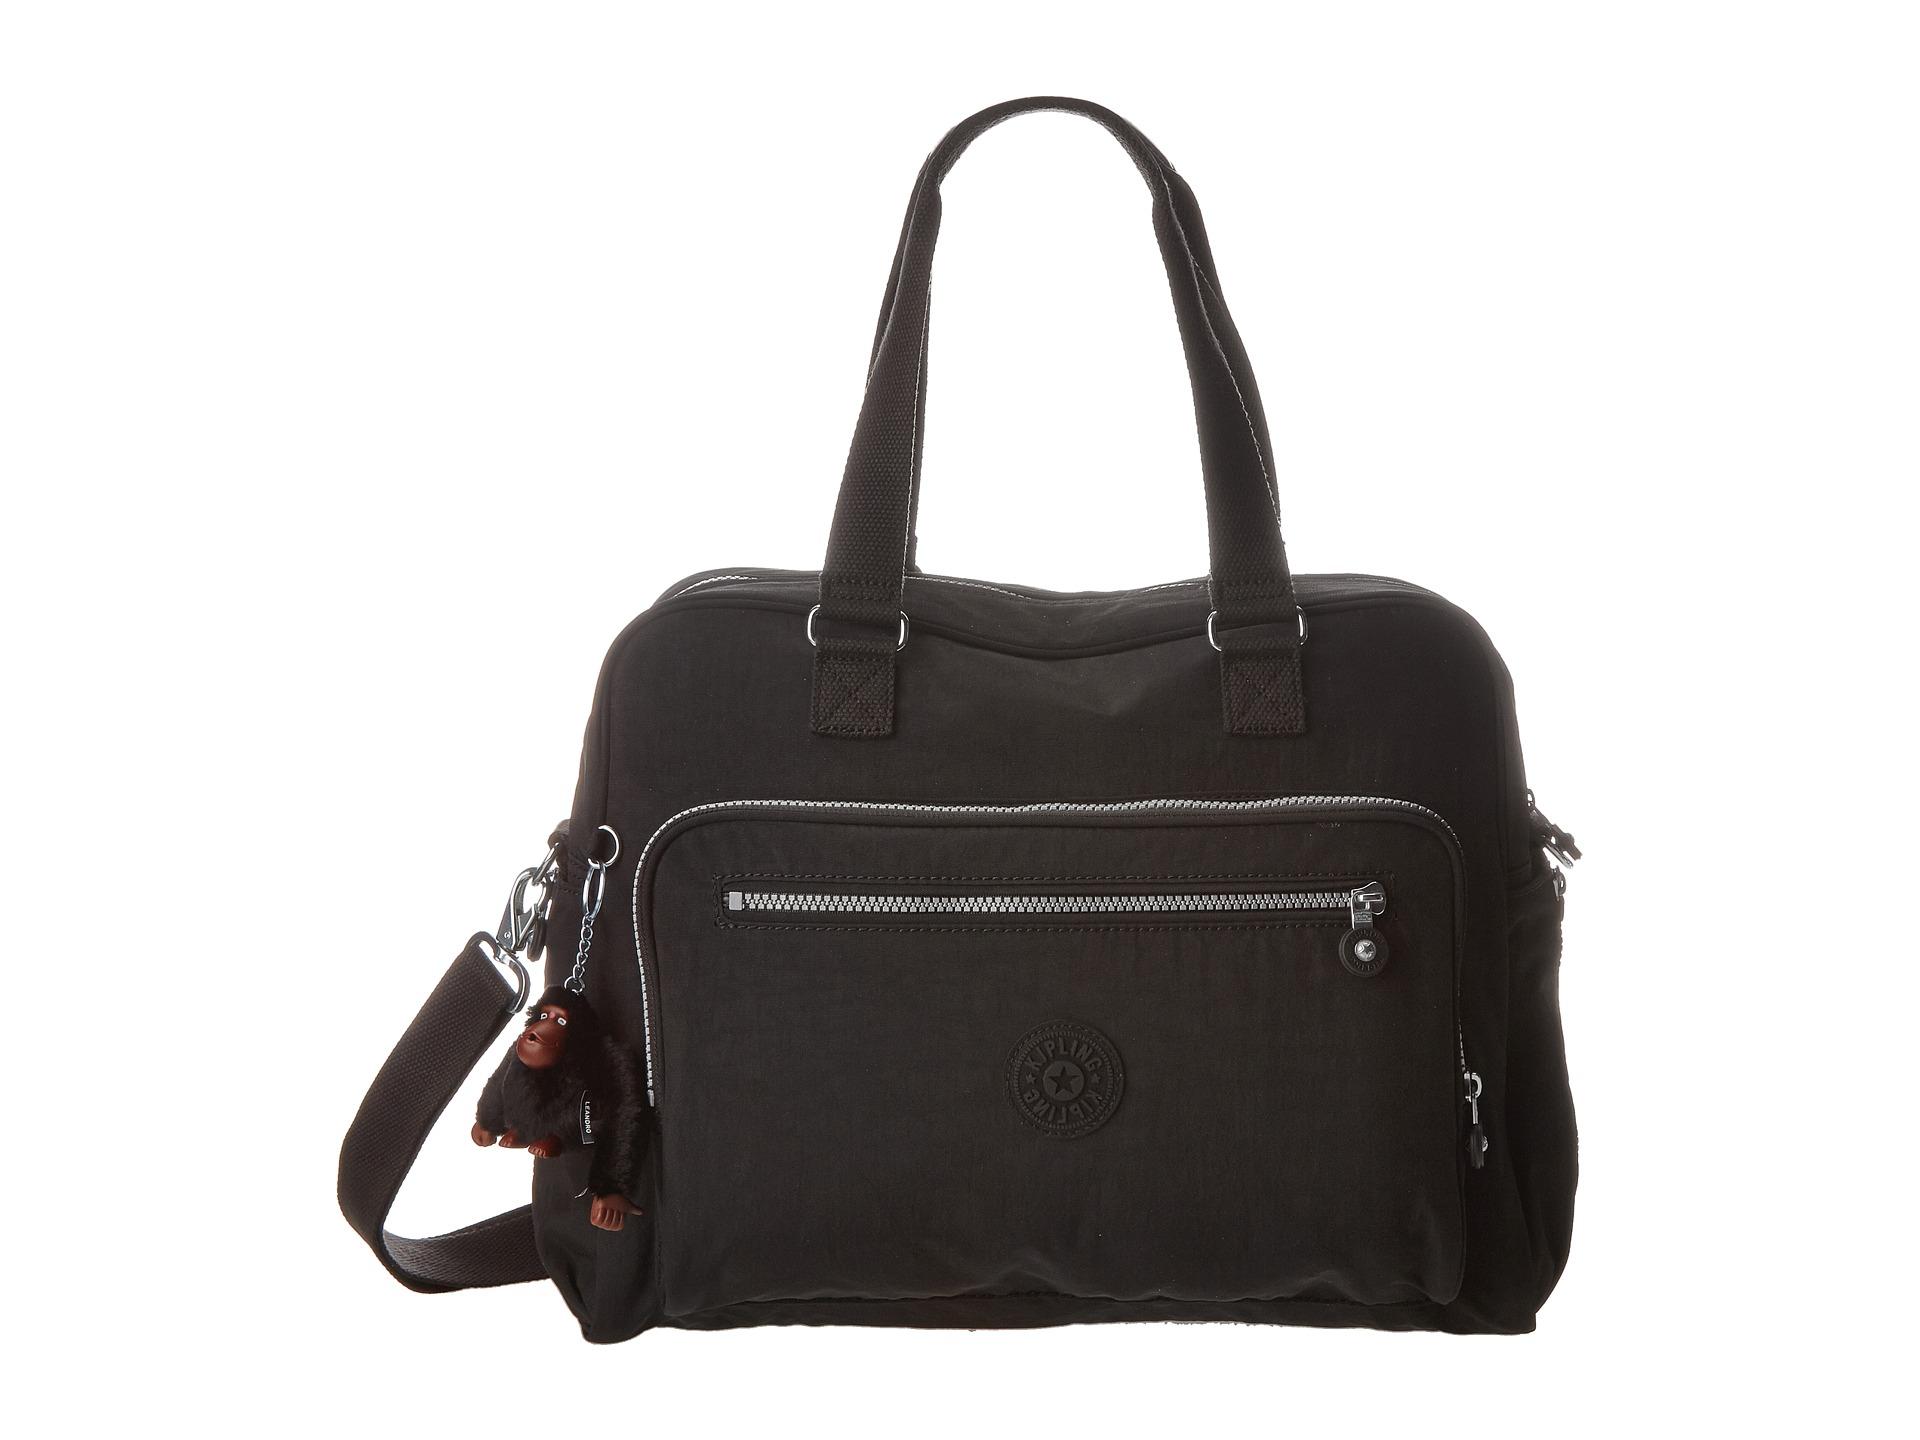 kipling baby bag  best bag  - kipling alanna baby bag review modern blue rakuten ichiba global market